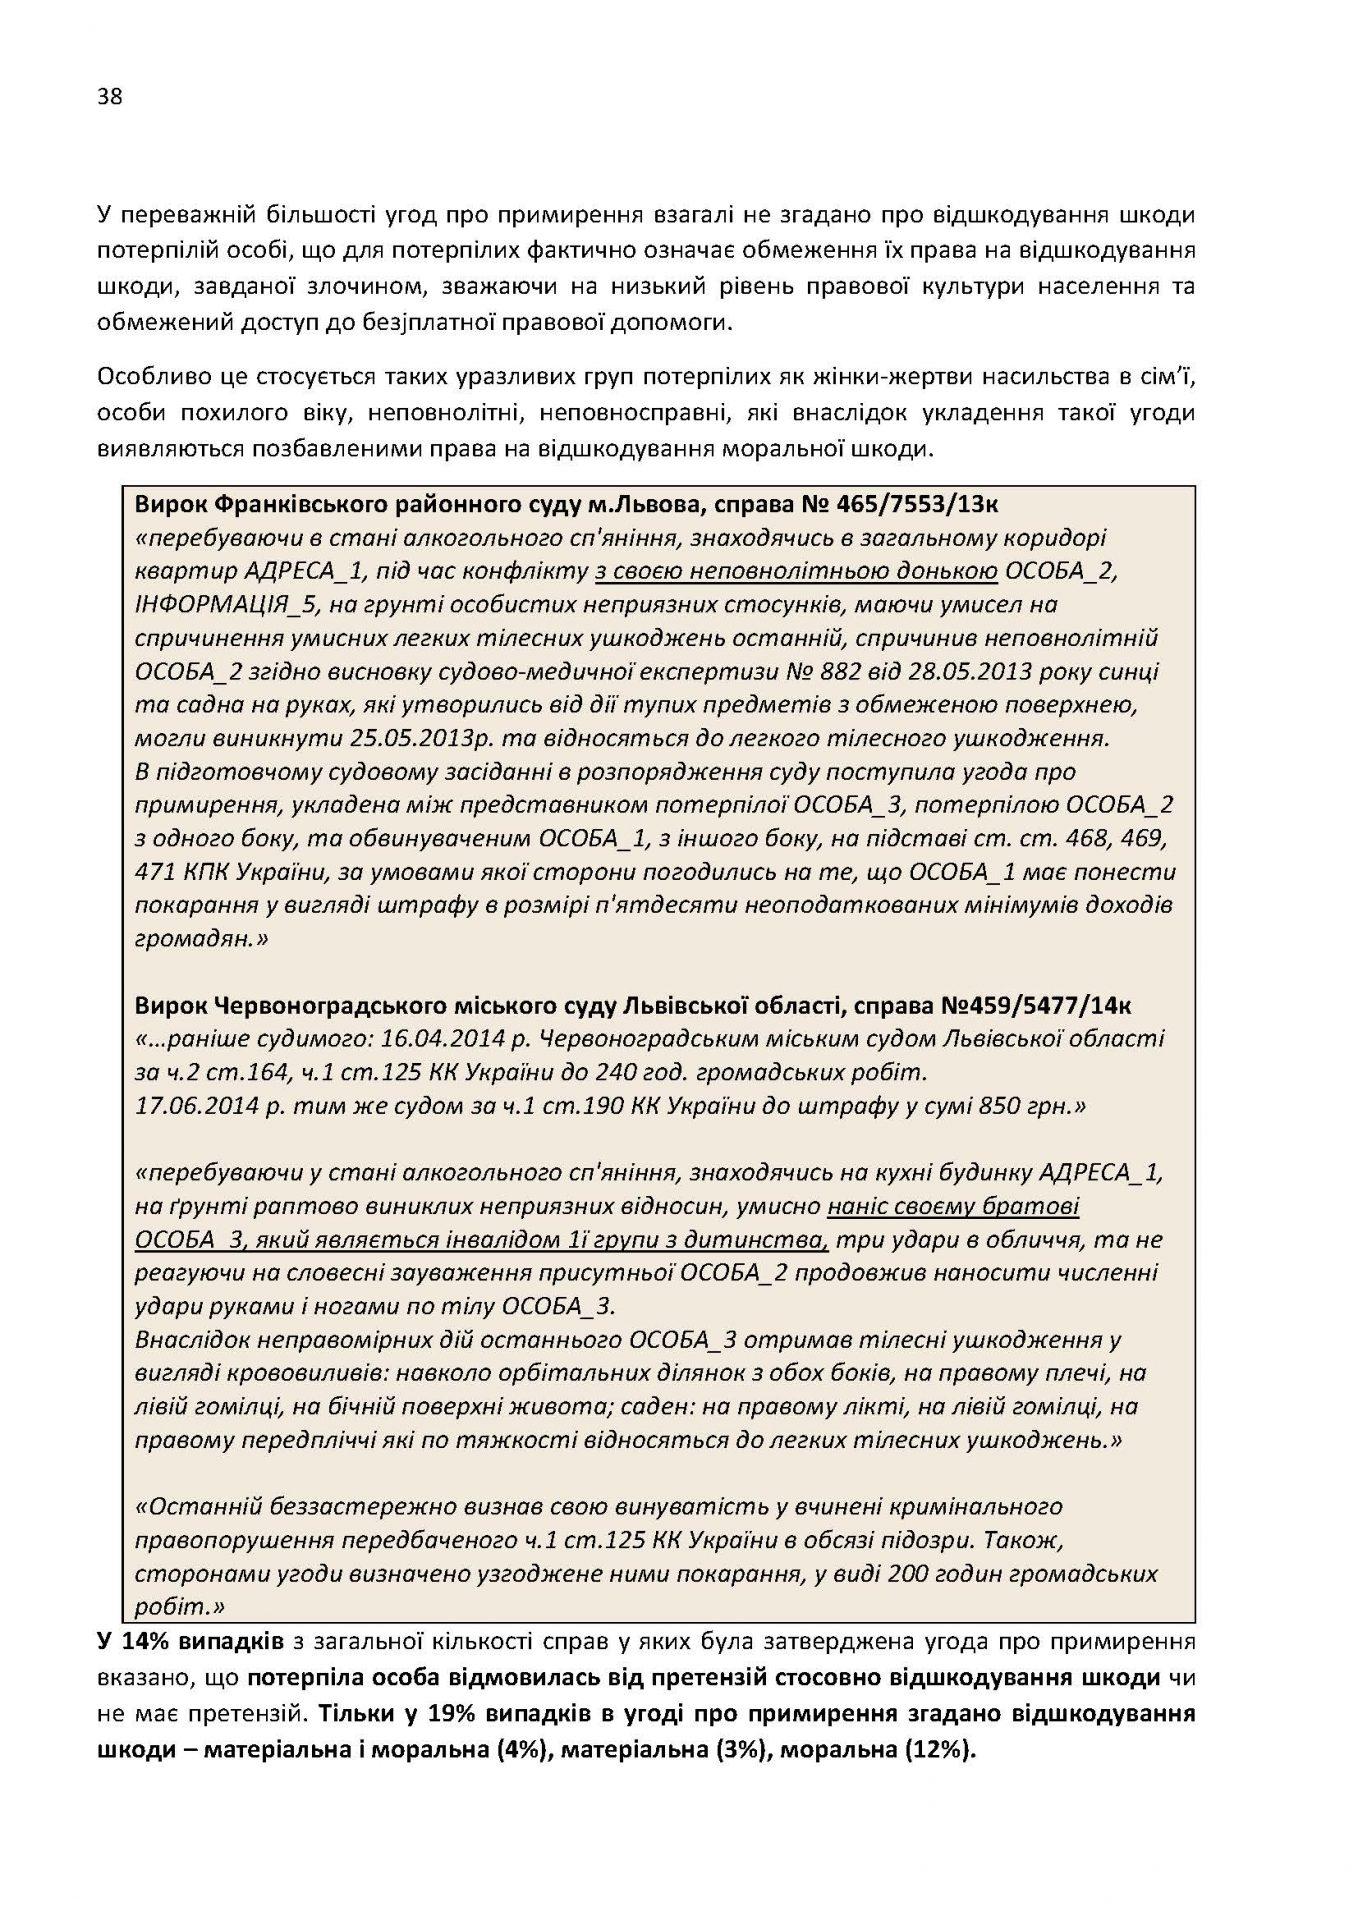 Draft Report monitoring print USAID_Страница_38